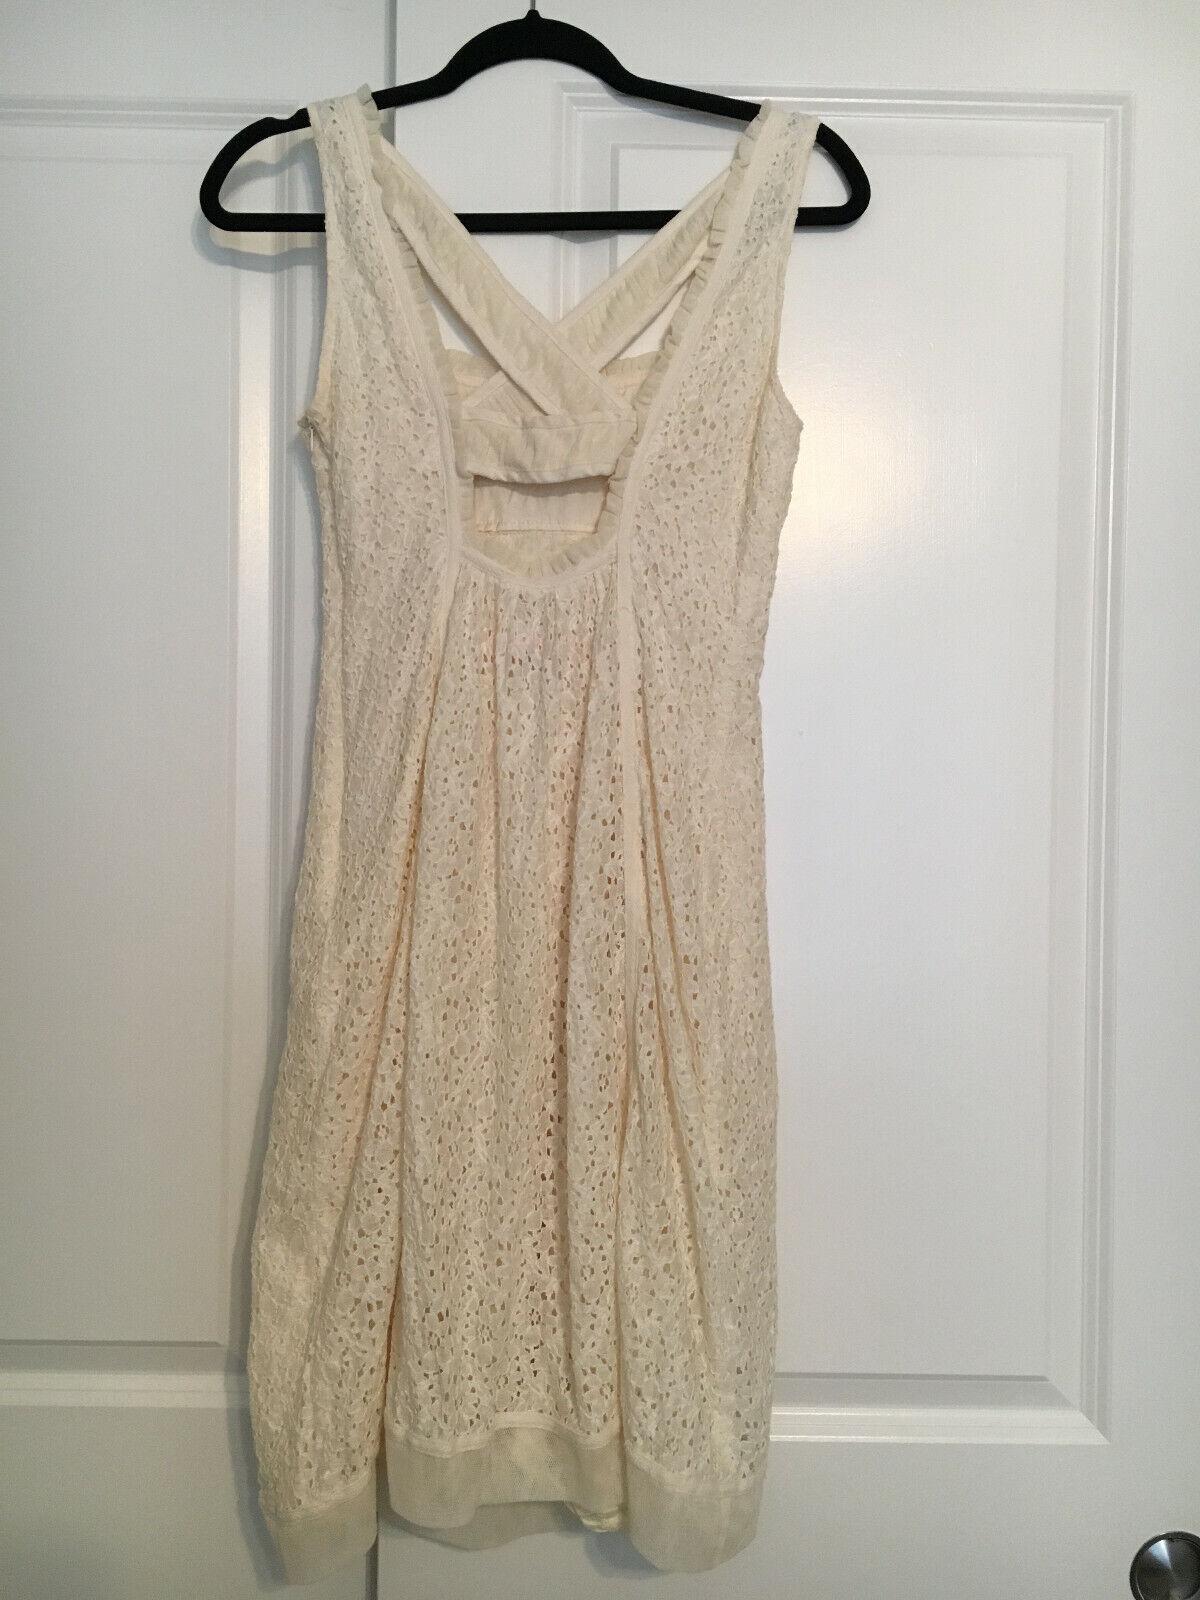 Cynthia Cynthia Steffe Cream Lace Shift Dress 6